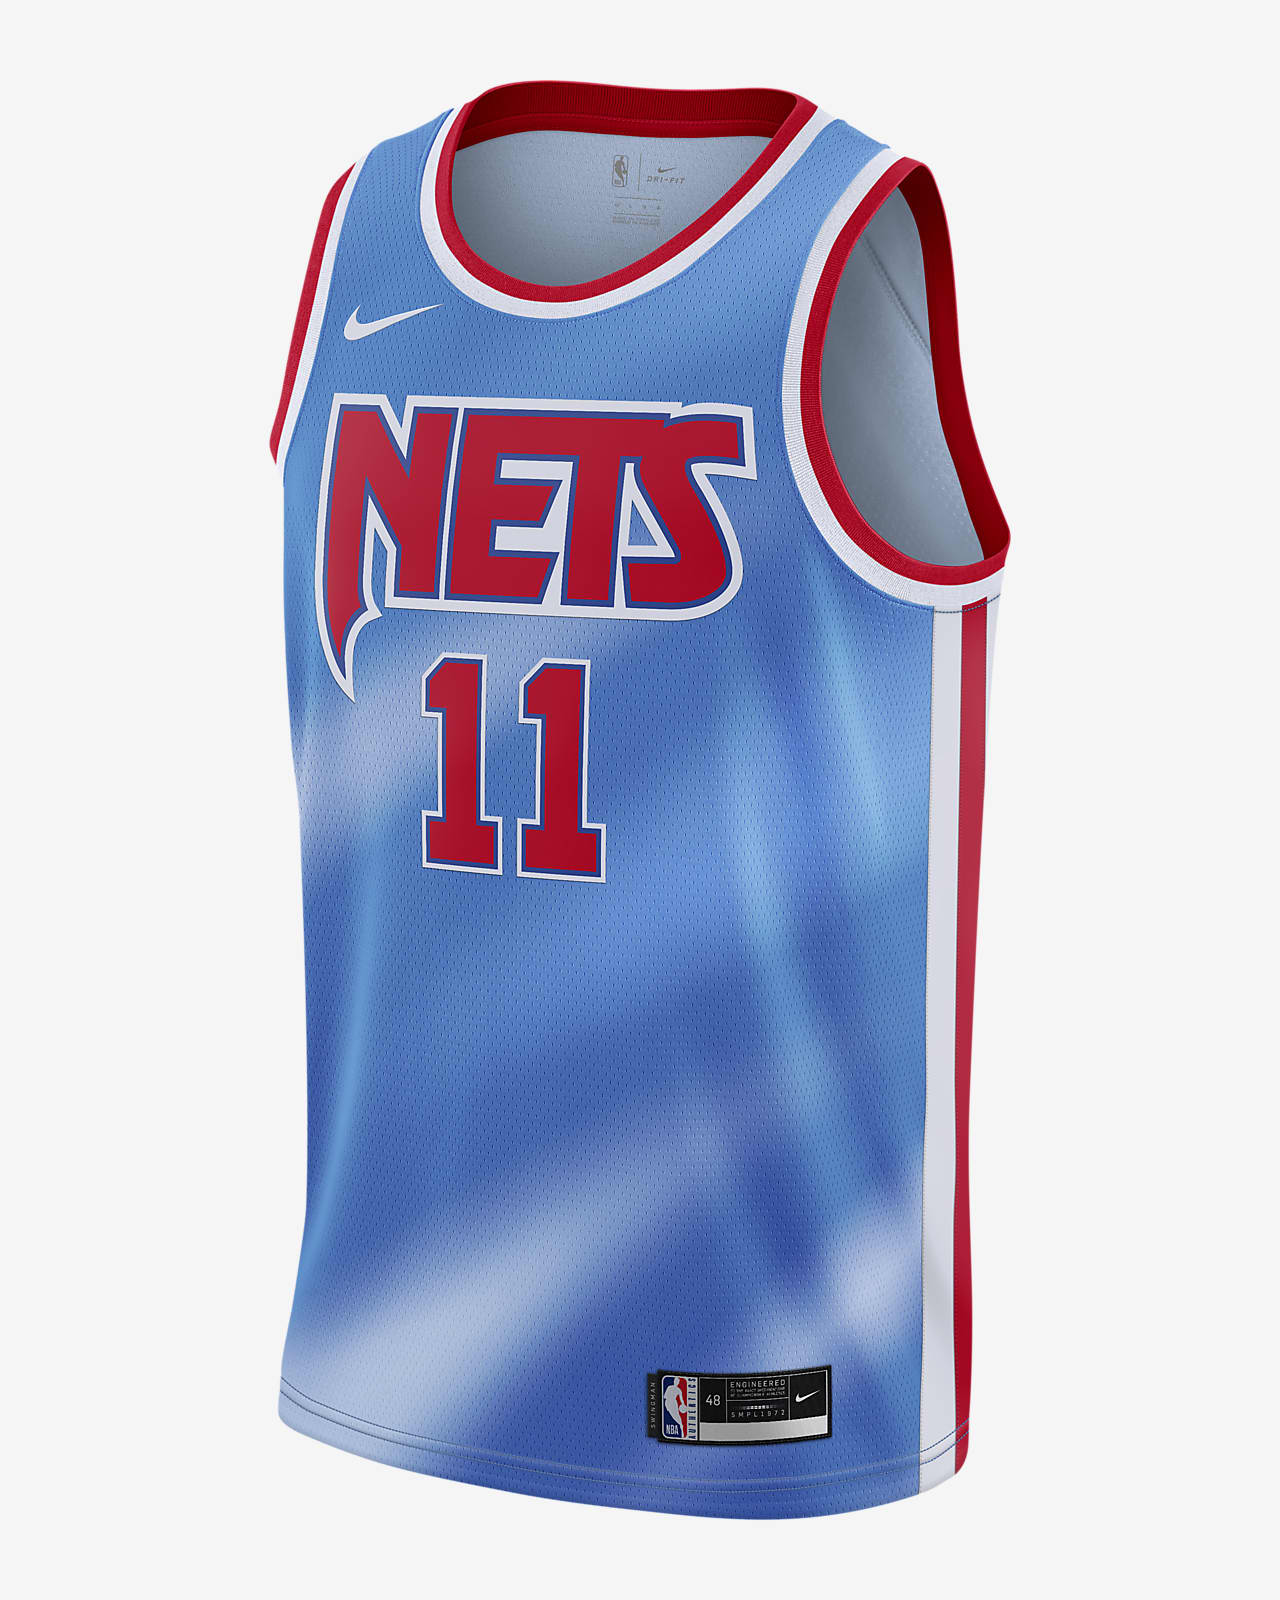 Maillot Nike NBA Swingman Kyrie Irving Brooklyn Nets Classic Edition 2020